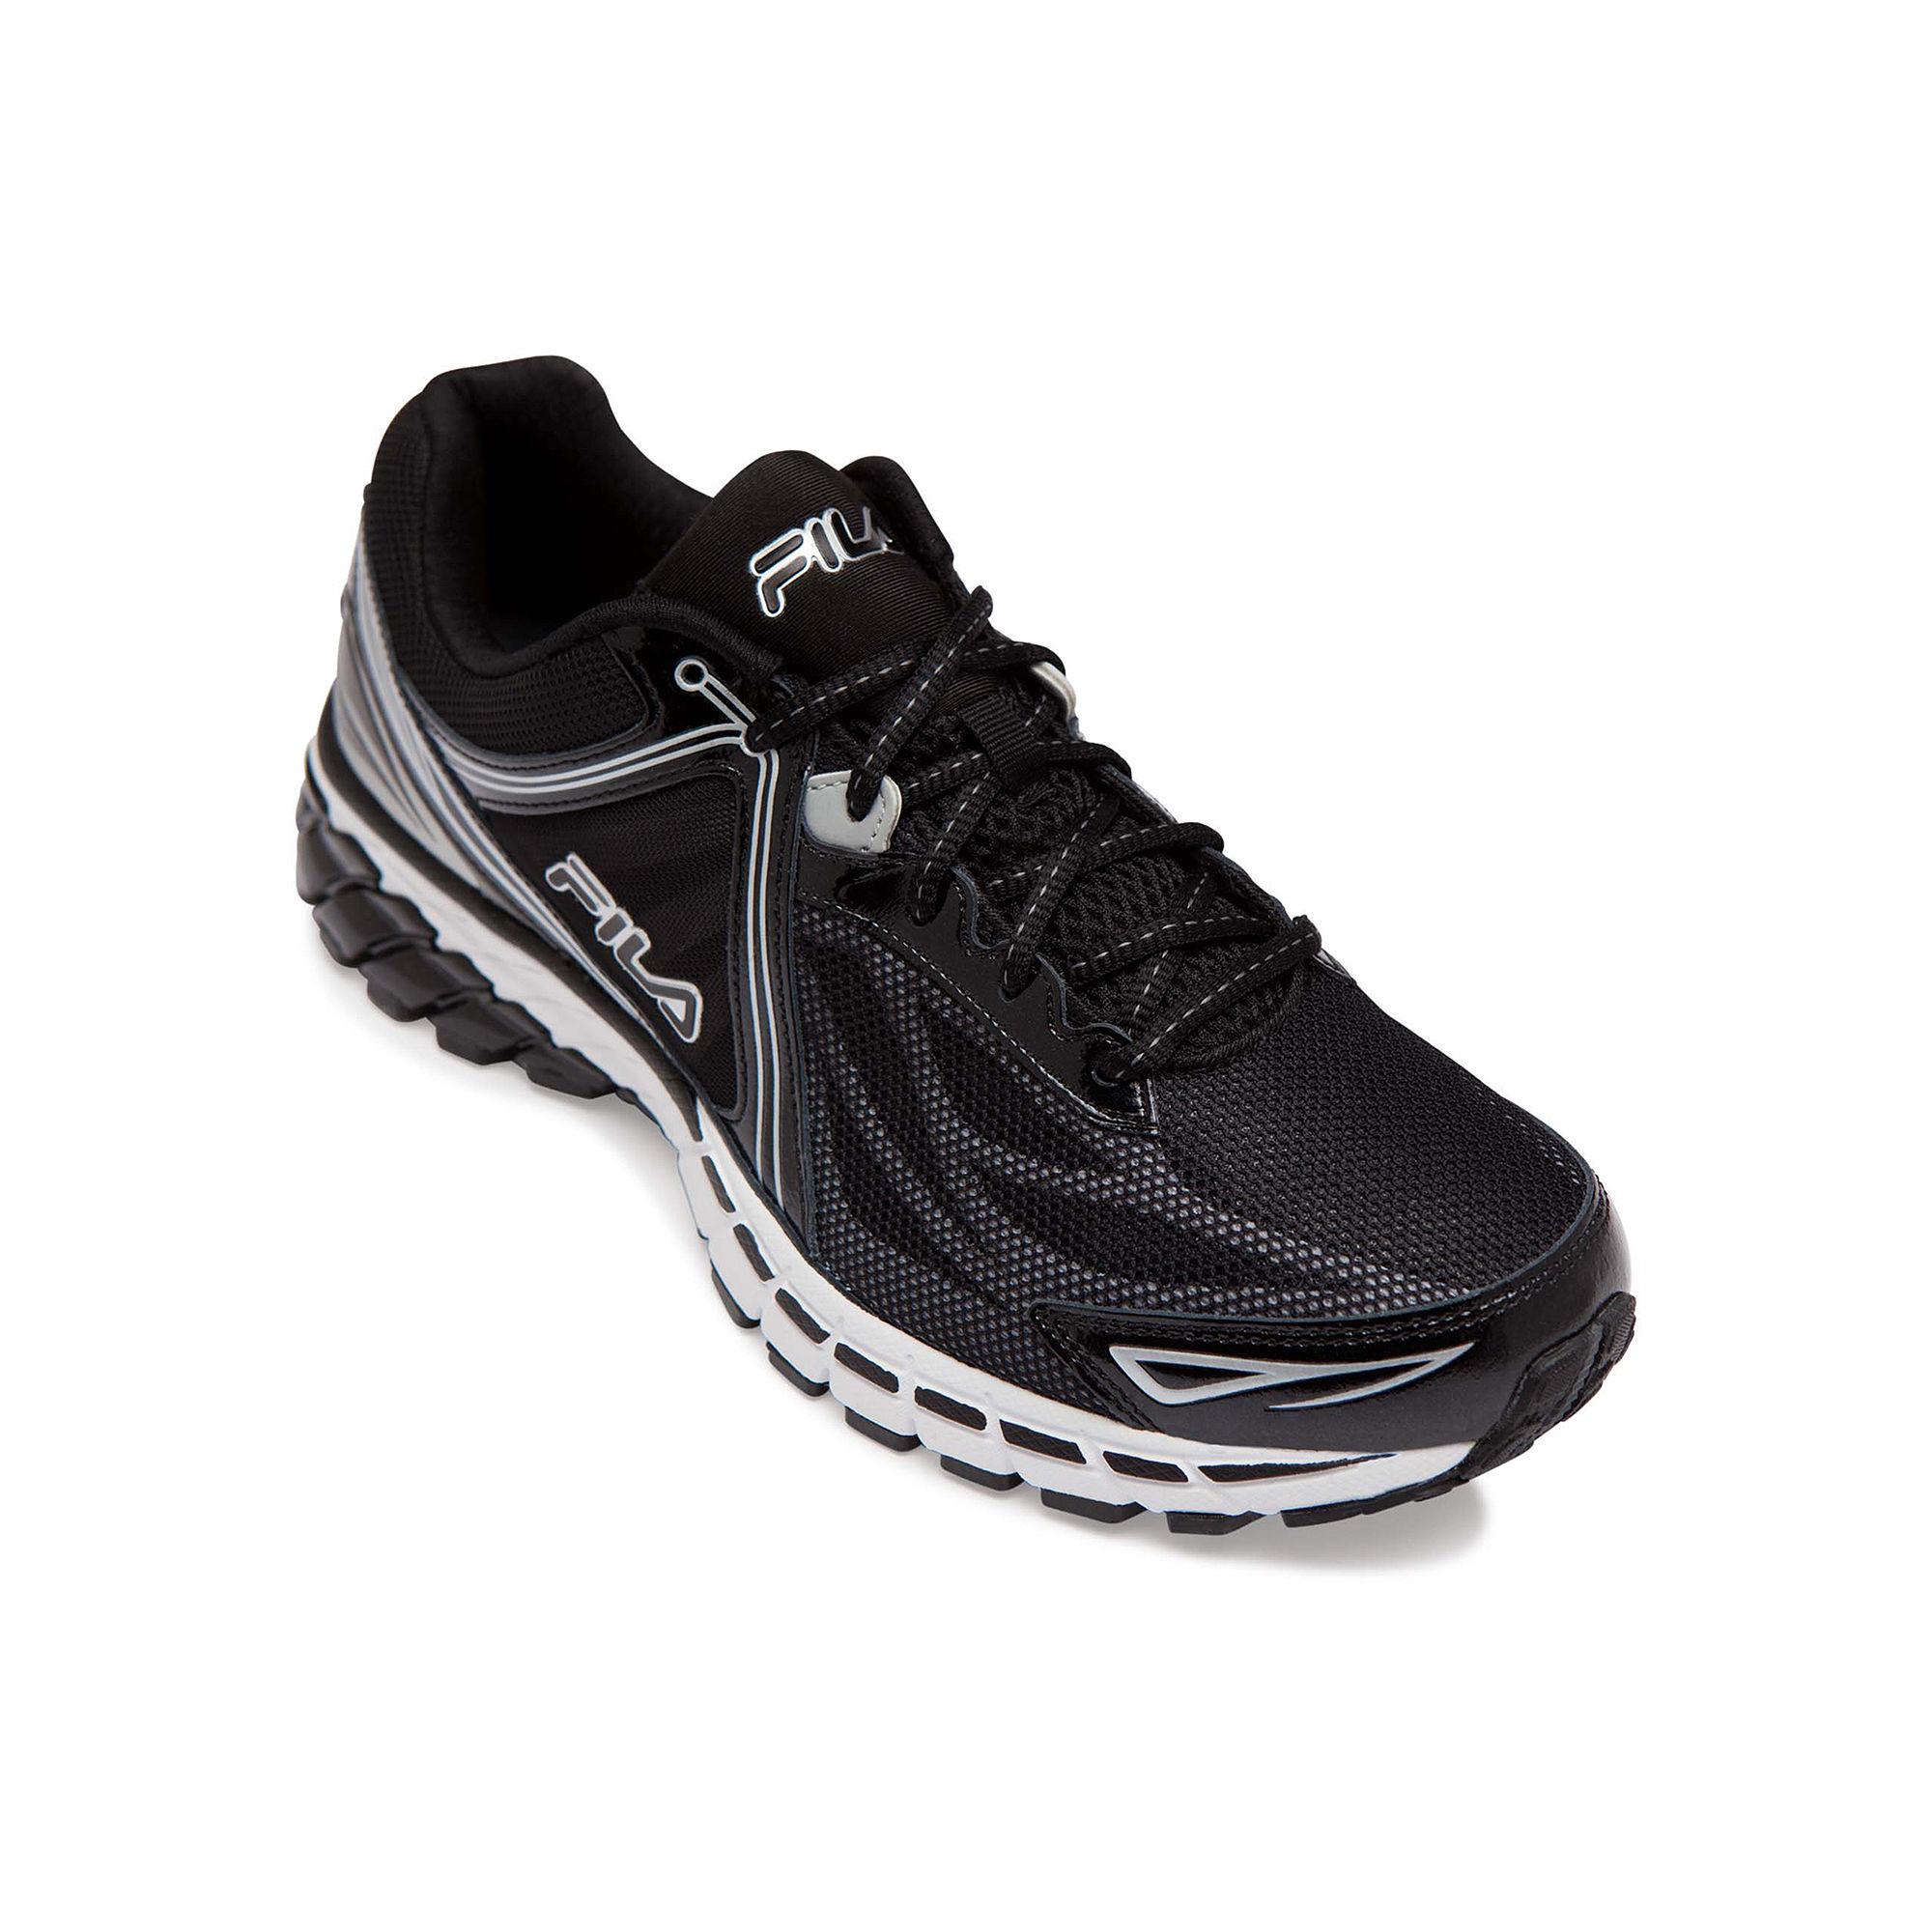 UPC 731616884264 Fila Men's Finix 2 Energized Running Shoe